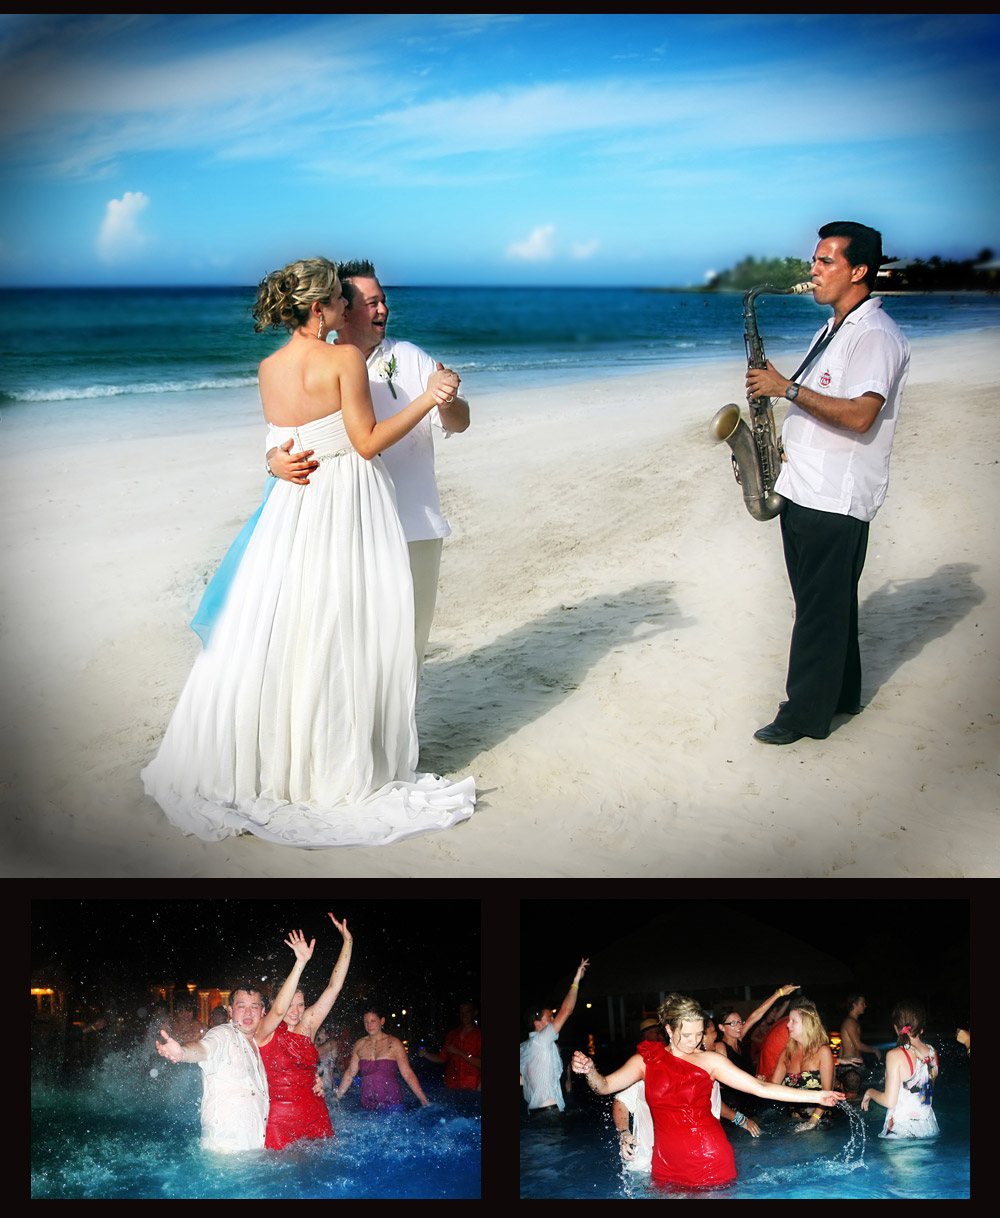 Destination Wedding Review.Destination Wedding And Hotel Review In Varadero Cuba